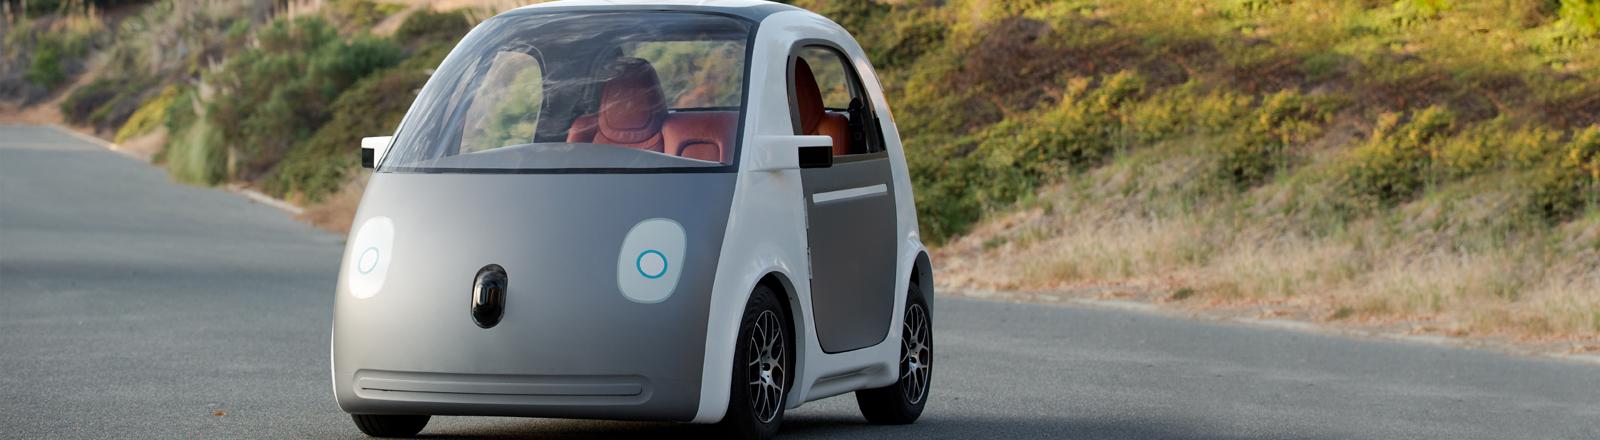 Ein selbstfahrendes Auto